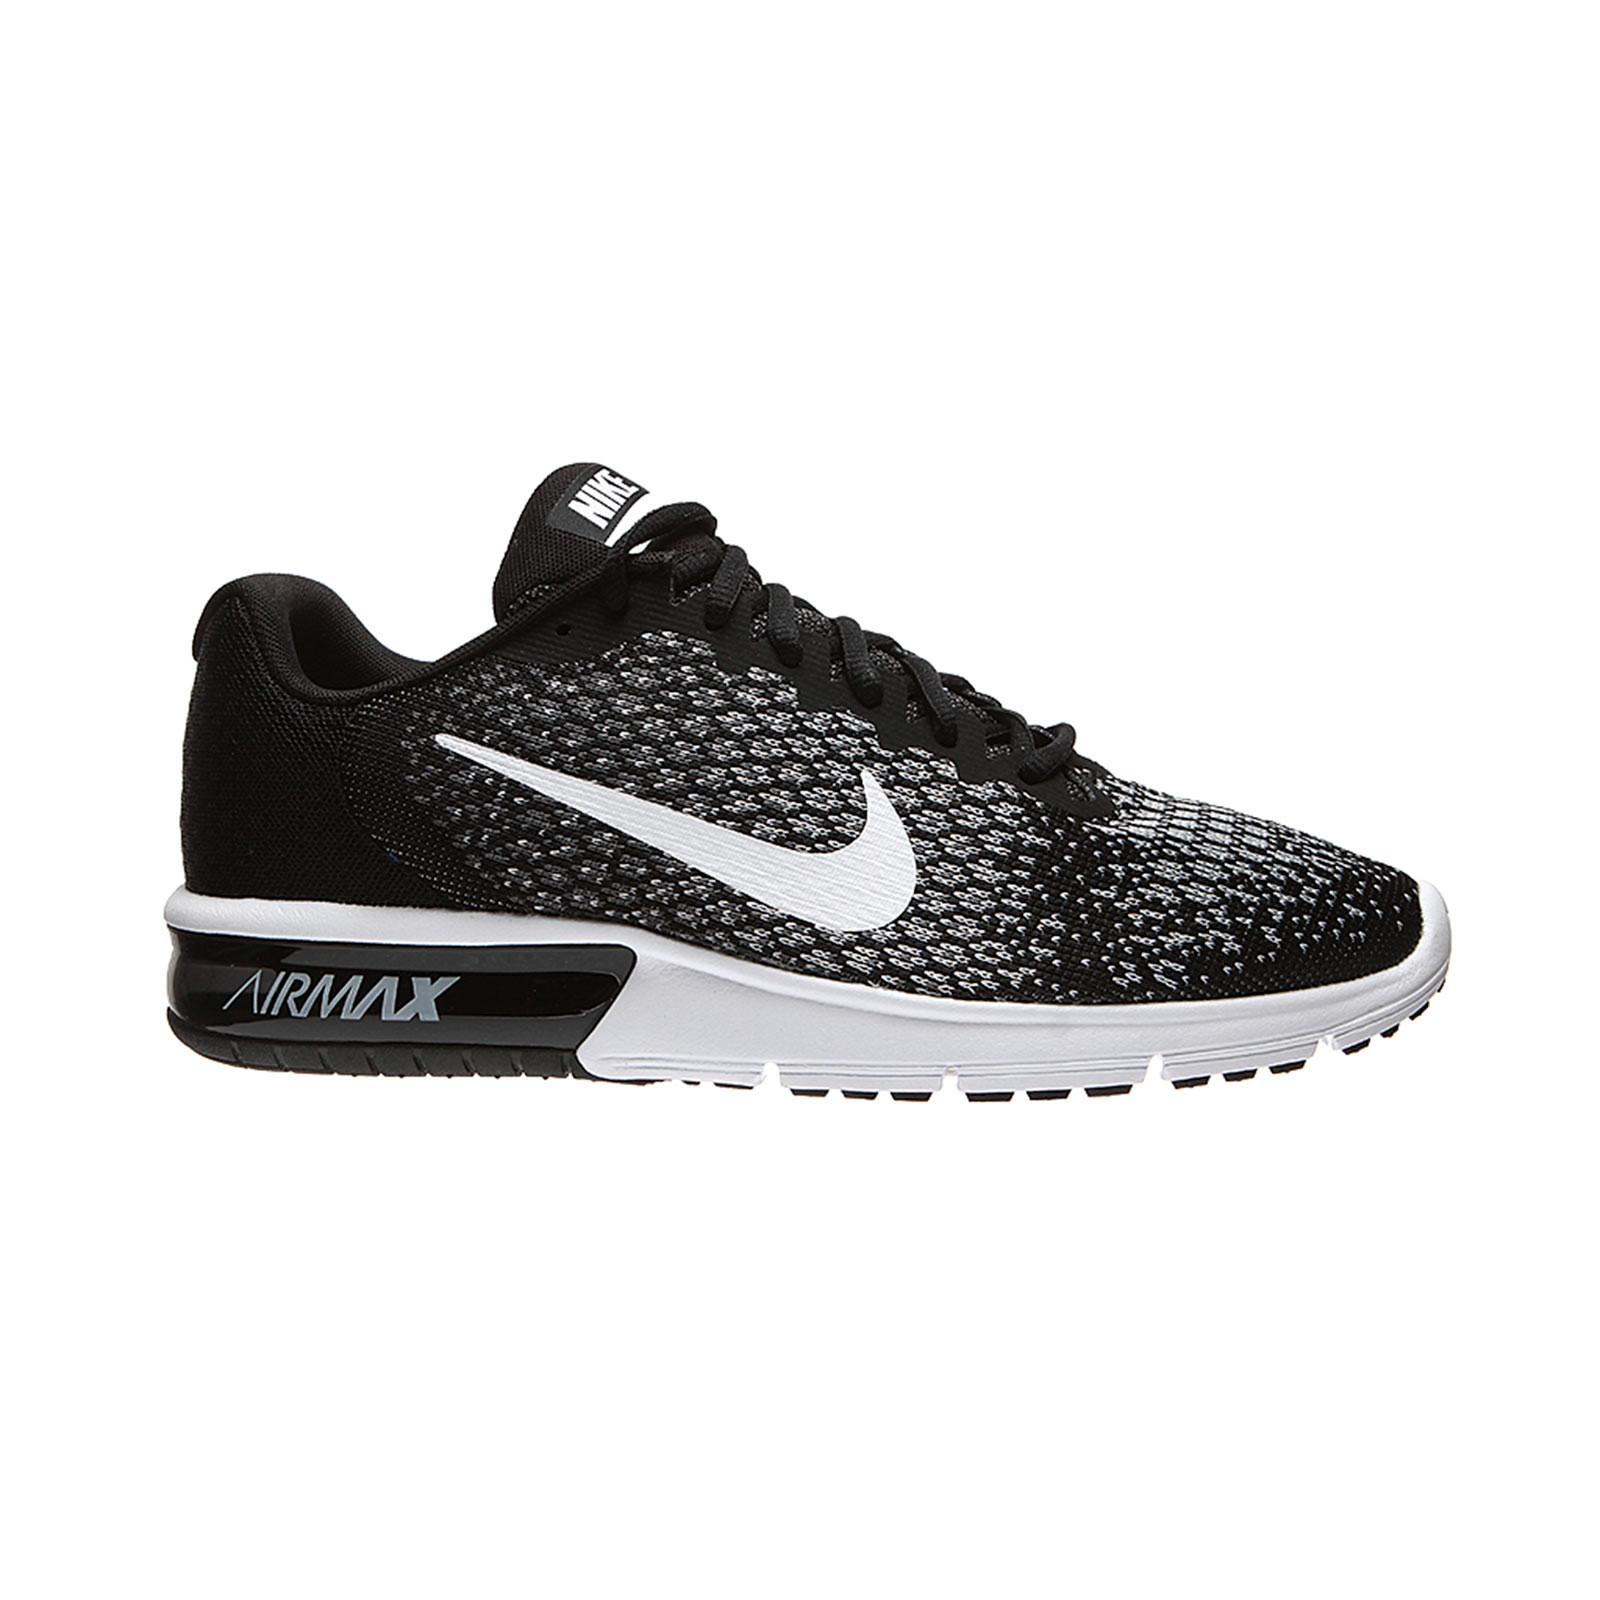 Zapatillas Nike Air Max Sequent 2 Running para Hombre